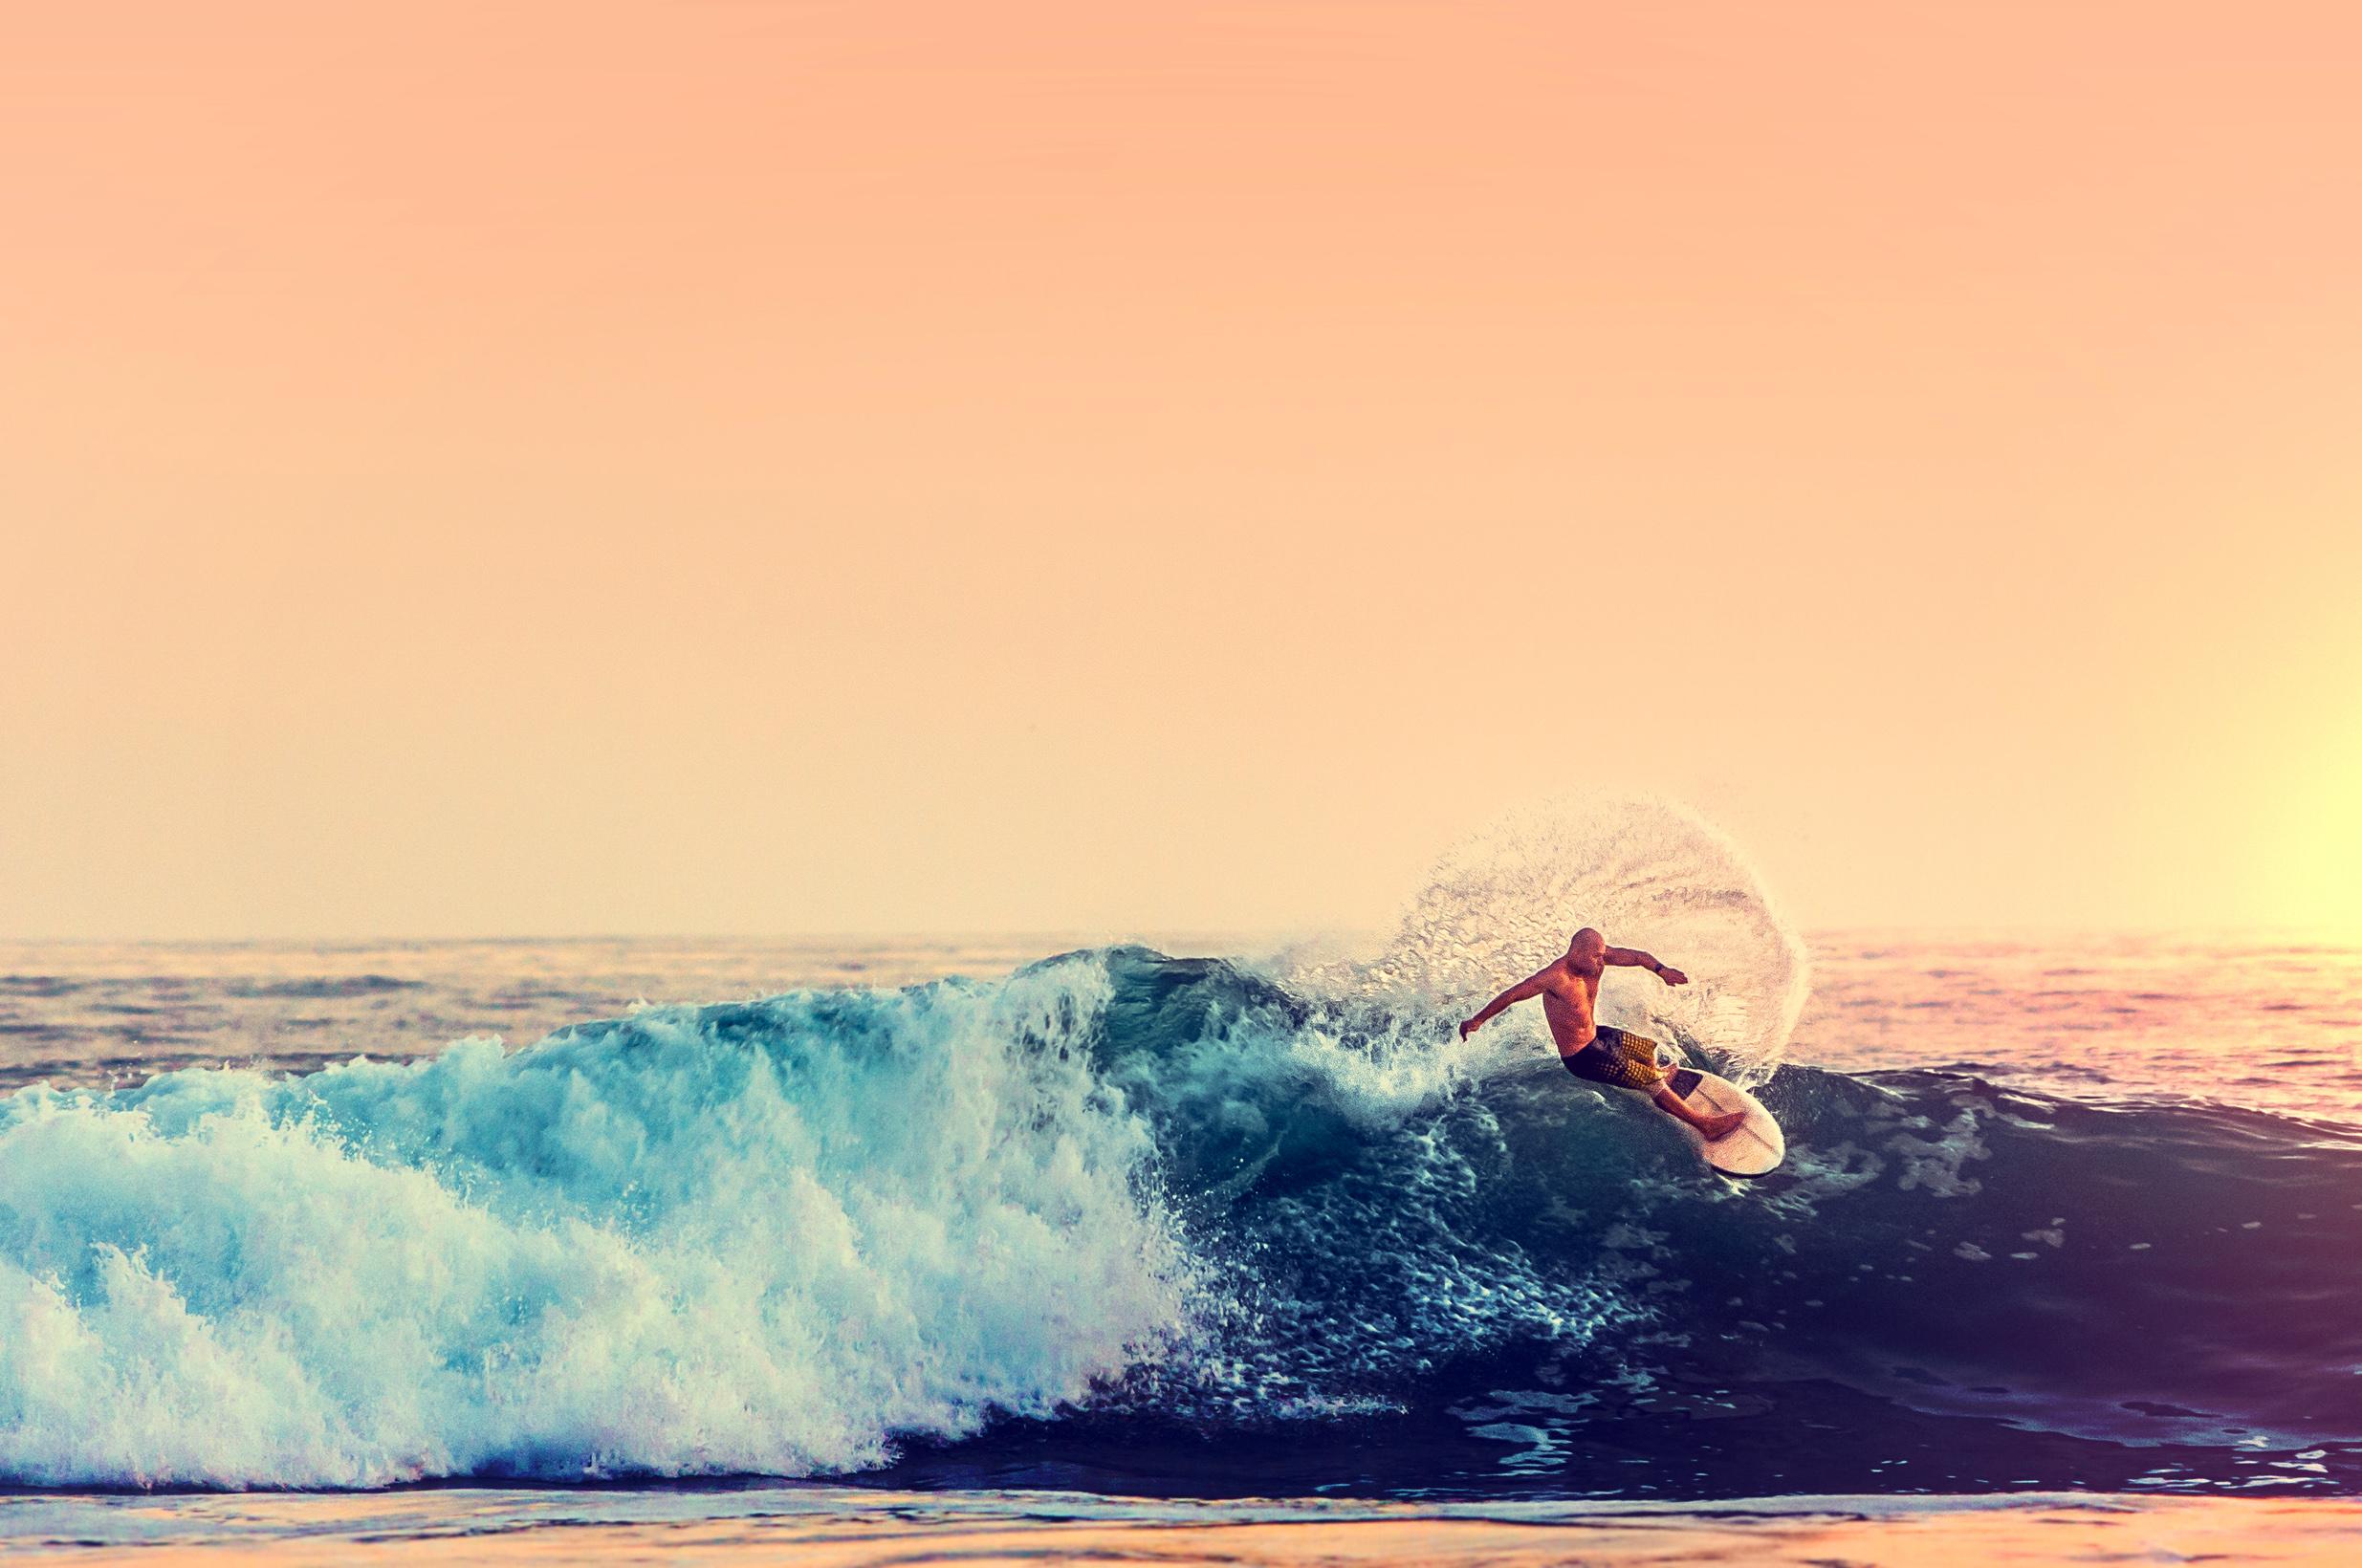 Surfer at sunset - color filtered photo